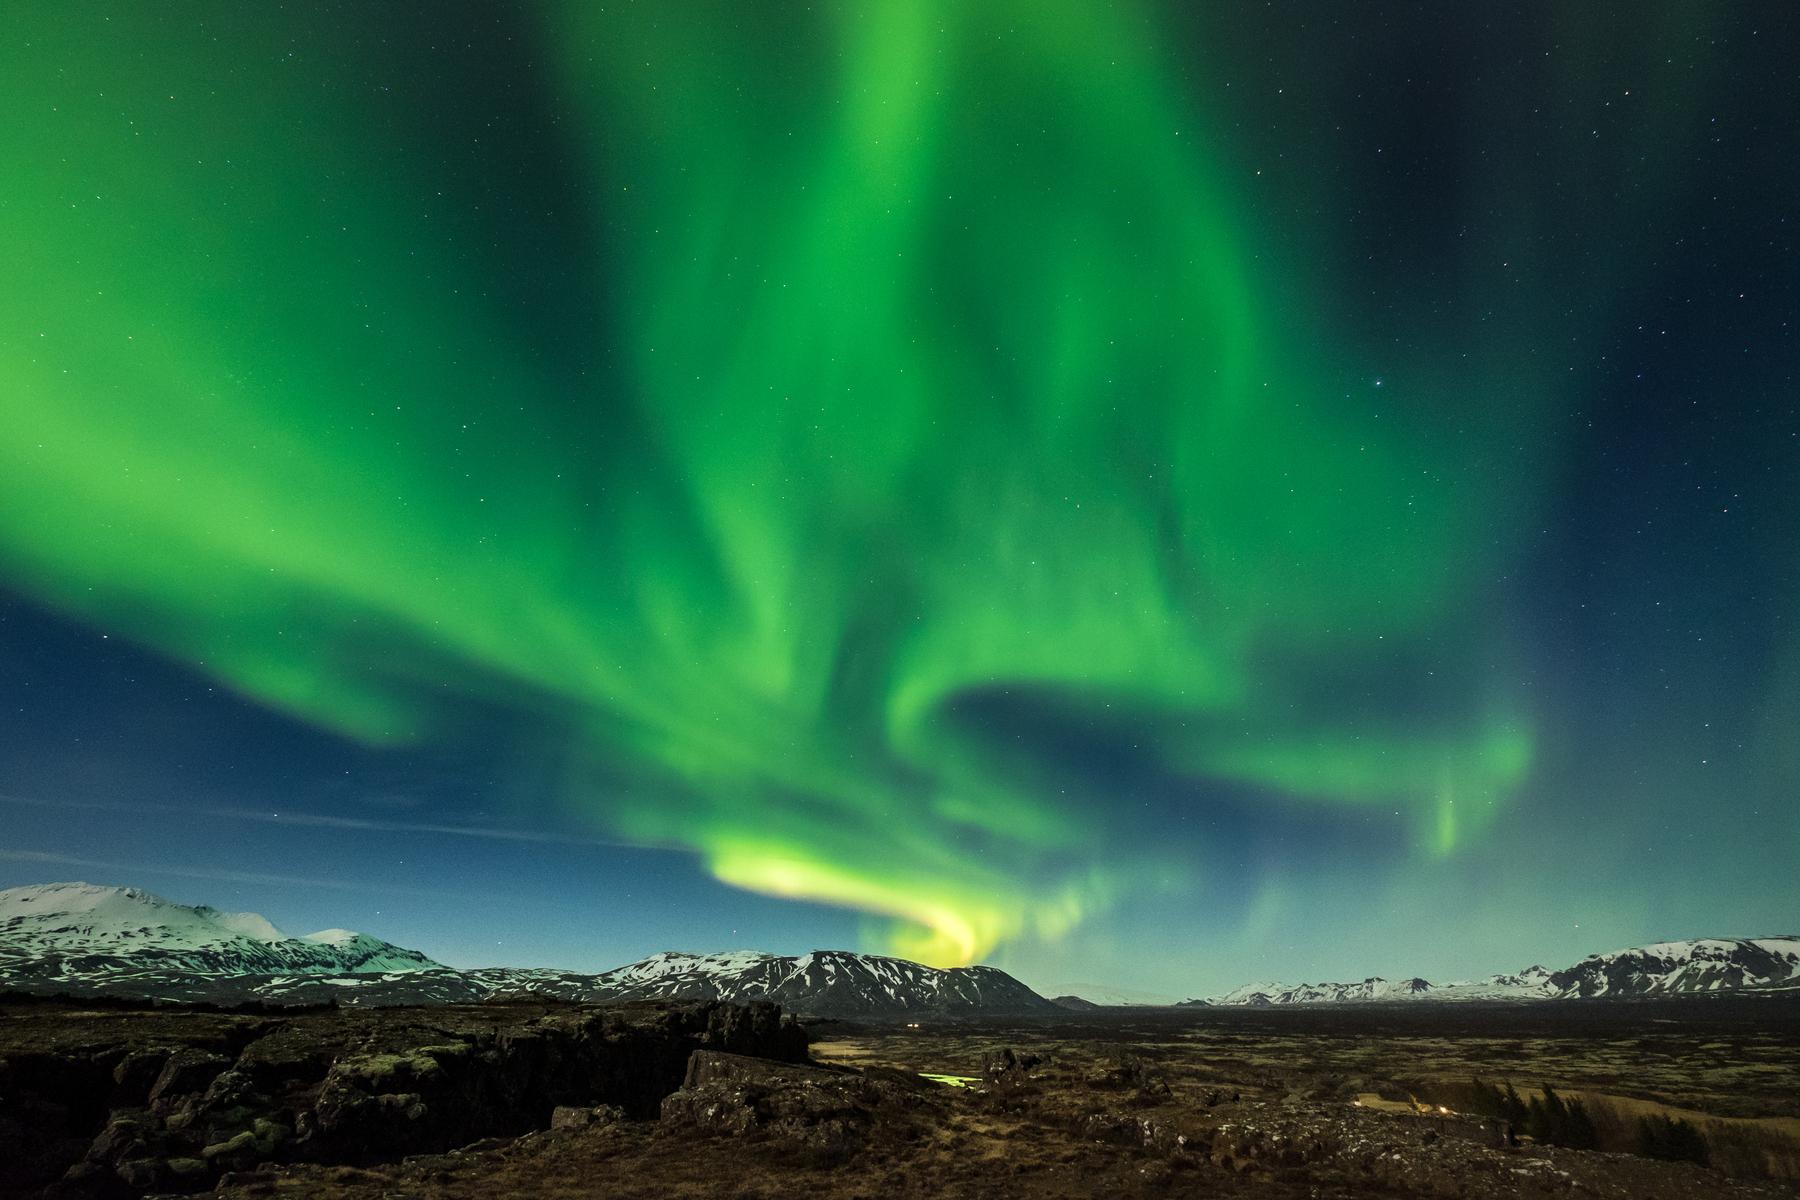 Winter Wonder Golden Circle Tour with Northern Lights Hunt